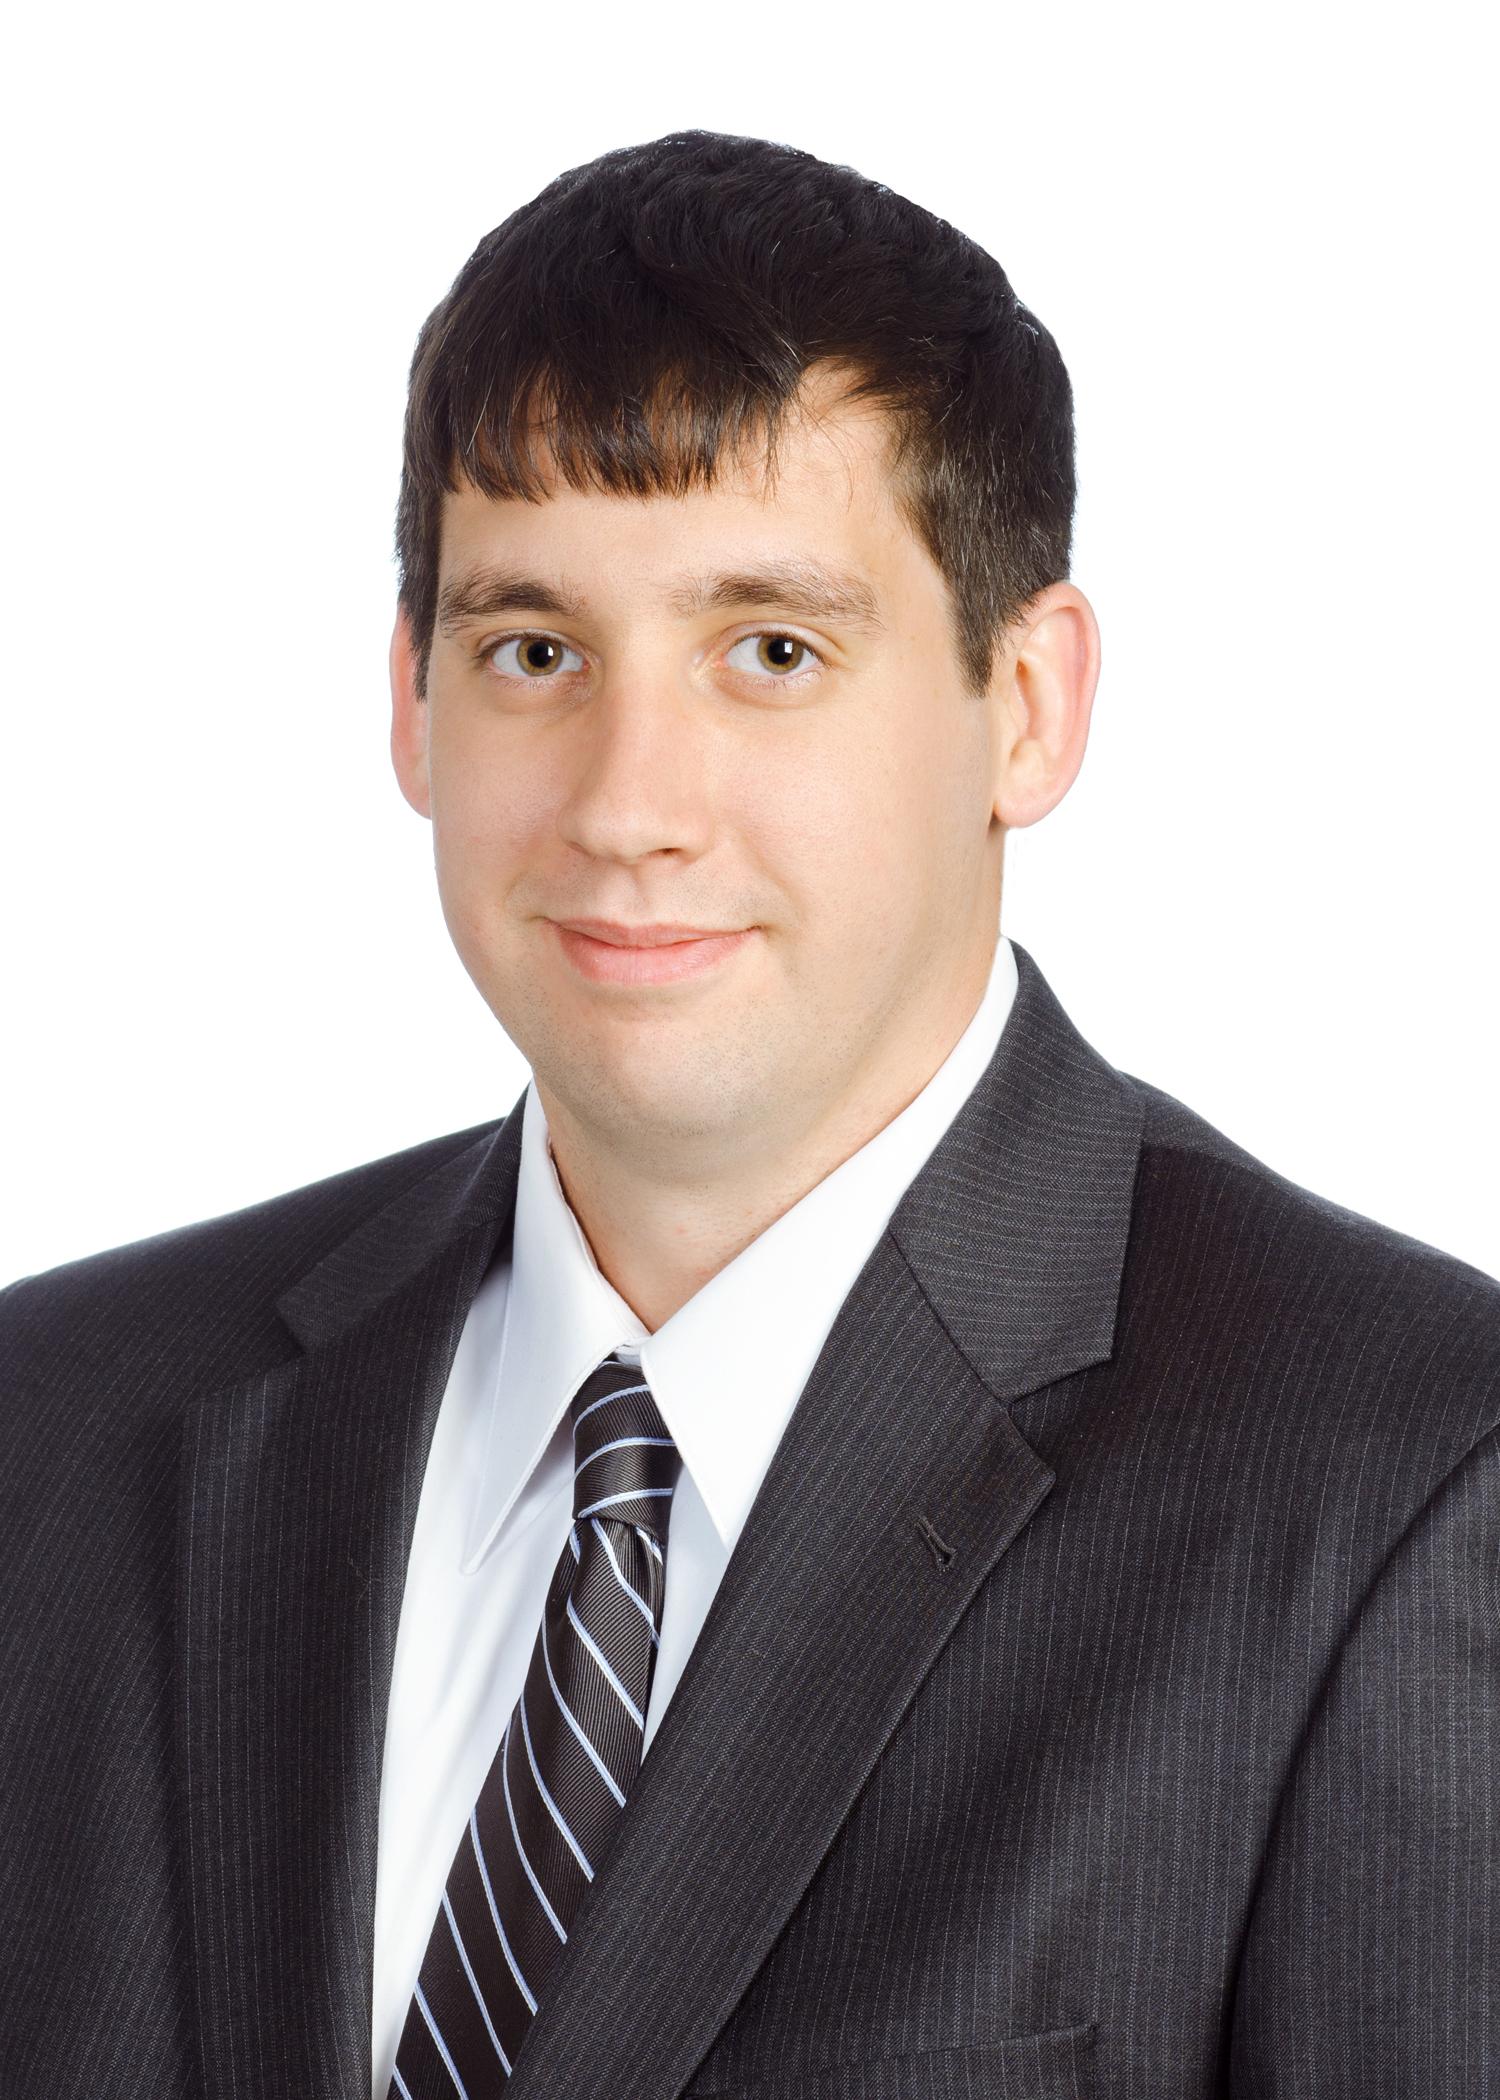 Eric D. Turner, CPA